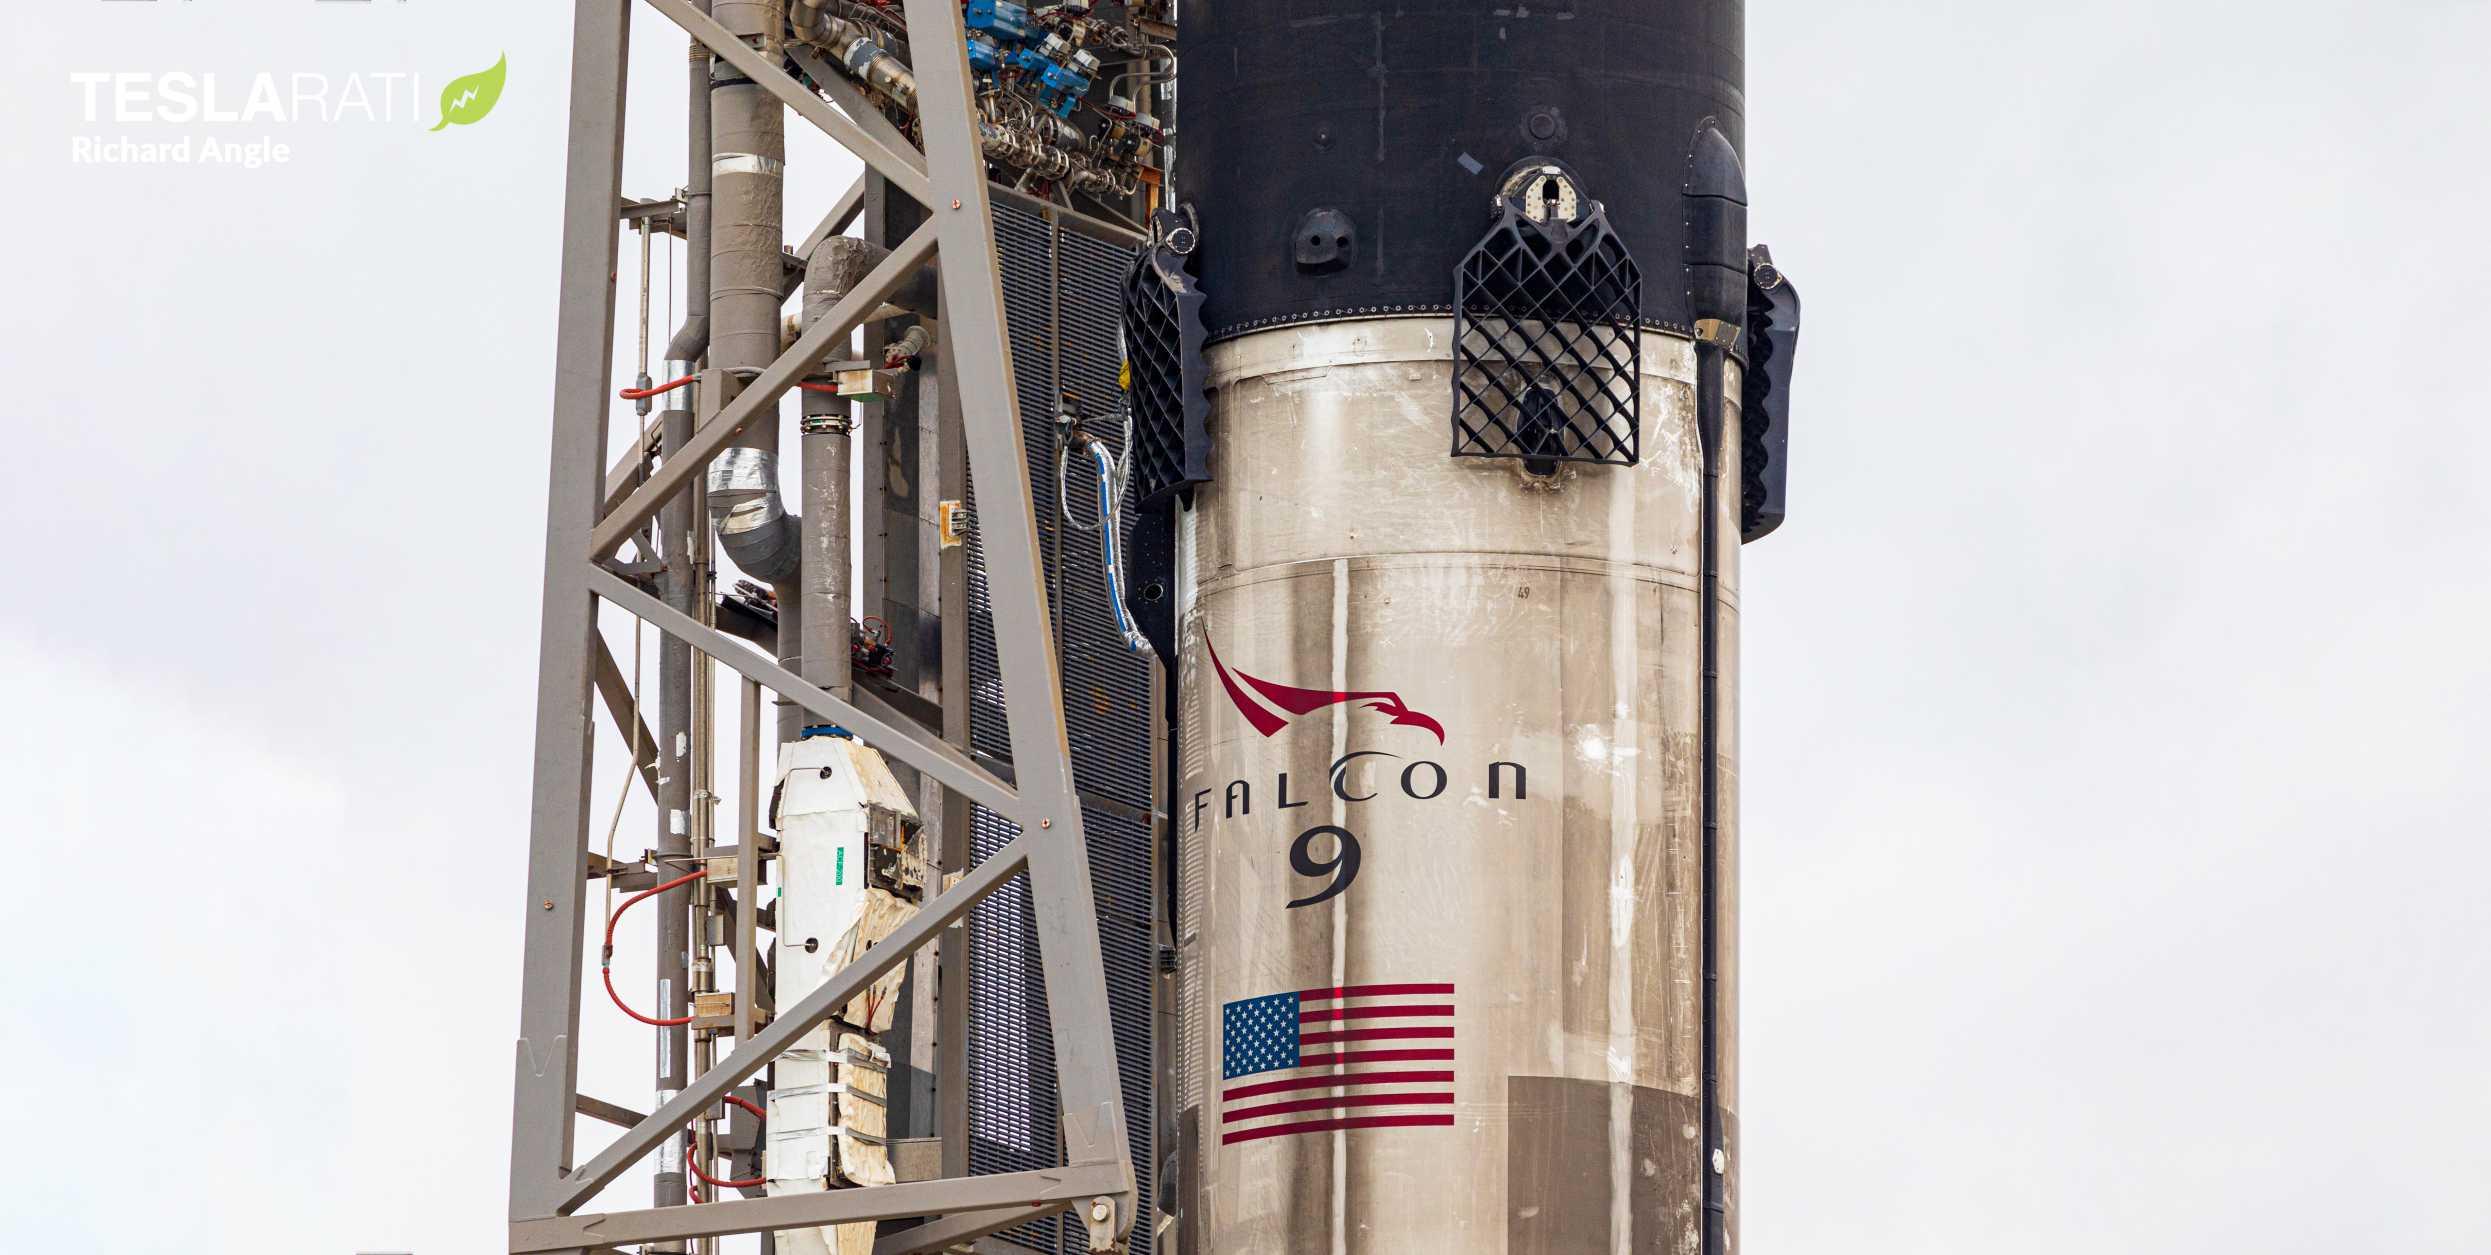 Starlink-8 Falcon 9 B1049 LC-40 060320 (Richard Angle) prelaunch (4) (c)